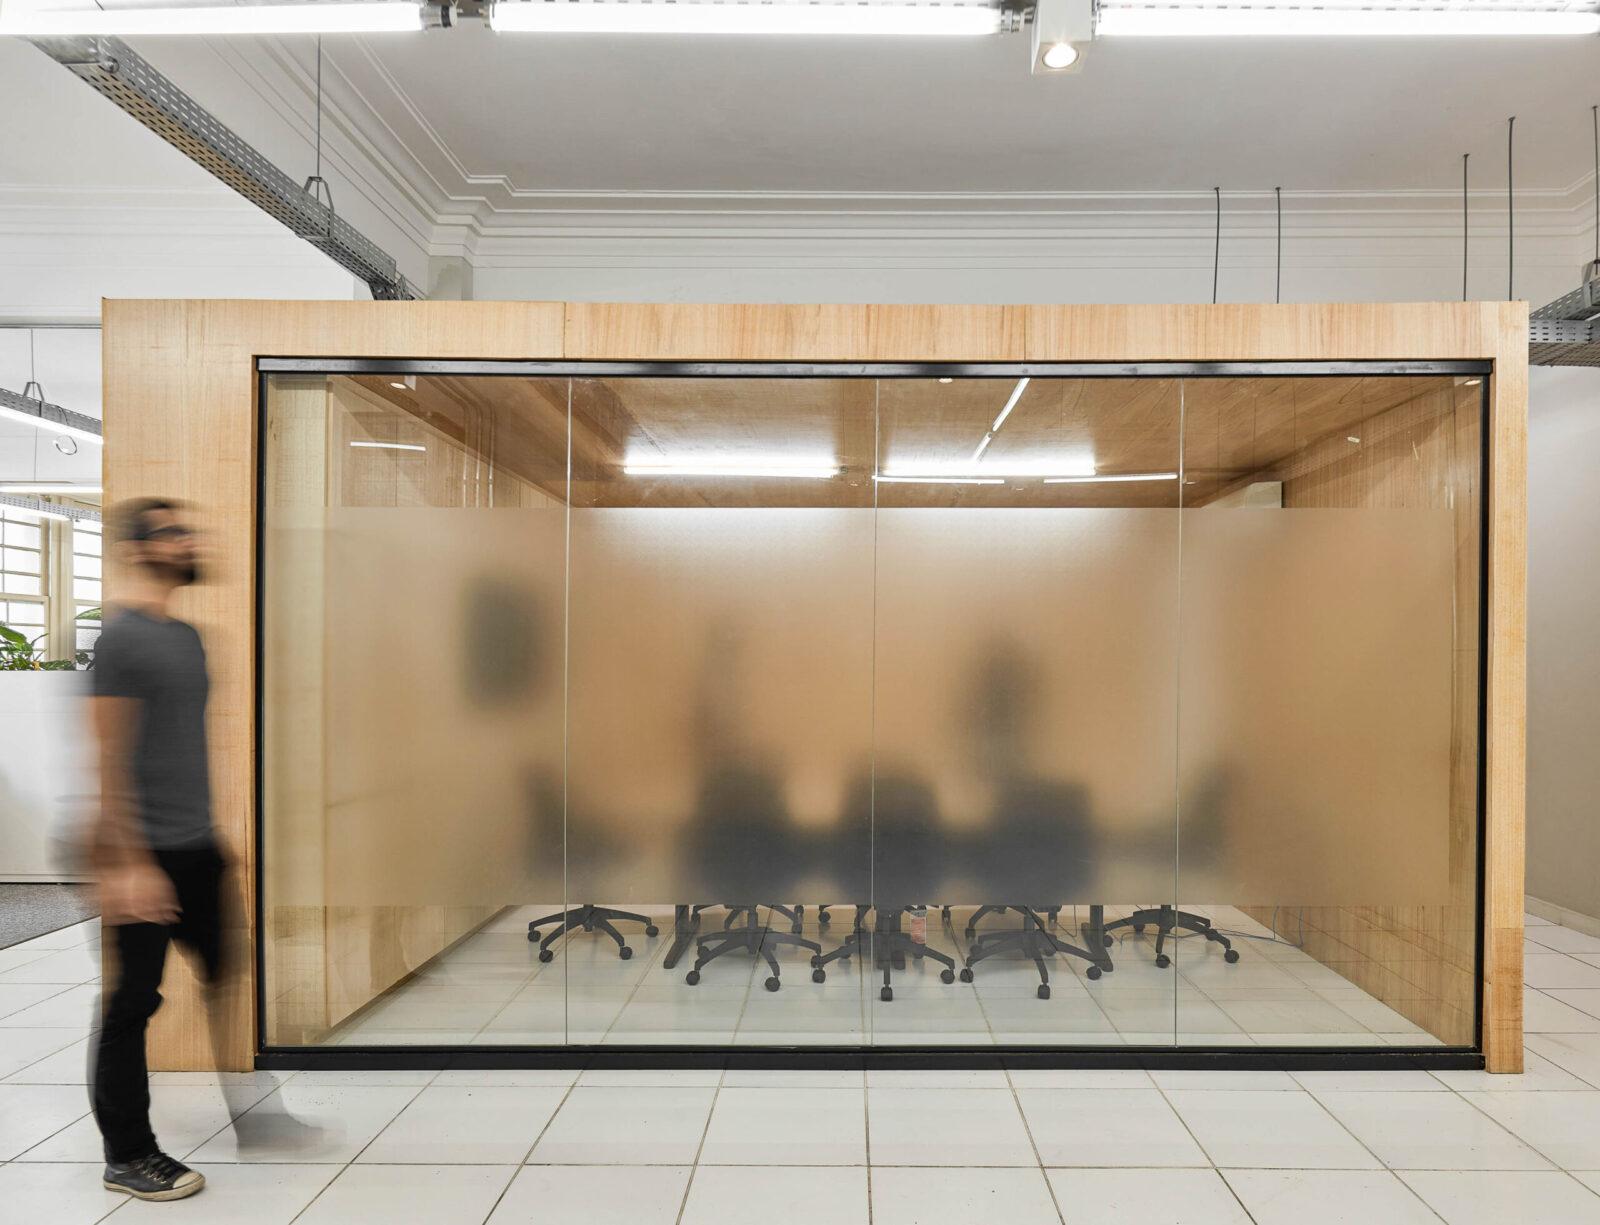 projeto de escritório sede belotur corporativo belo horizonte mobio gabriel castro arquitetura